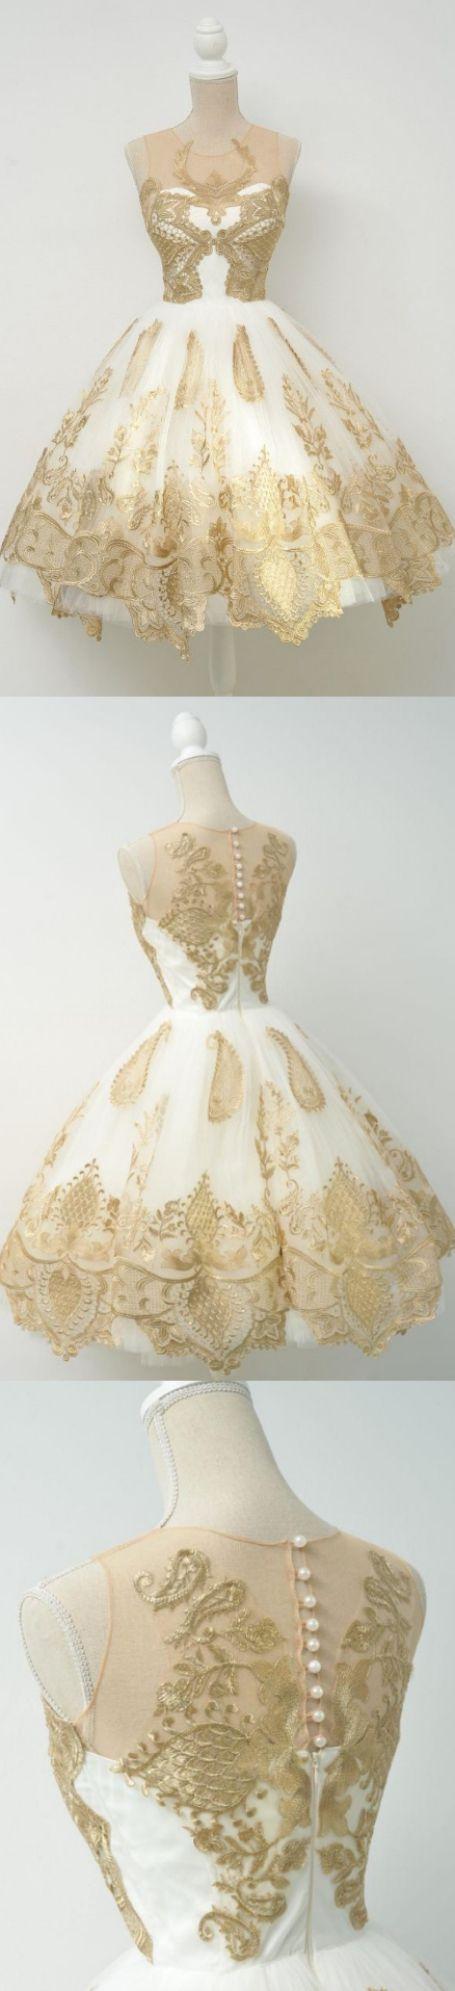 Pearl homecoming dresses gold alineprincess homecoming dresses